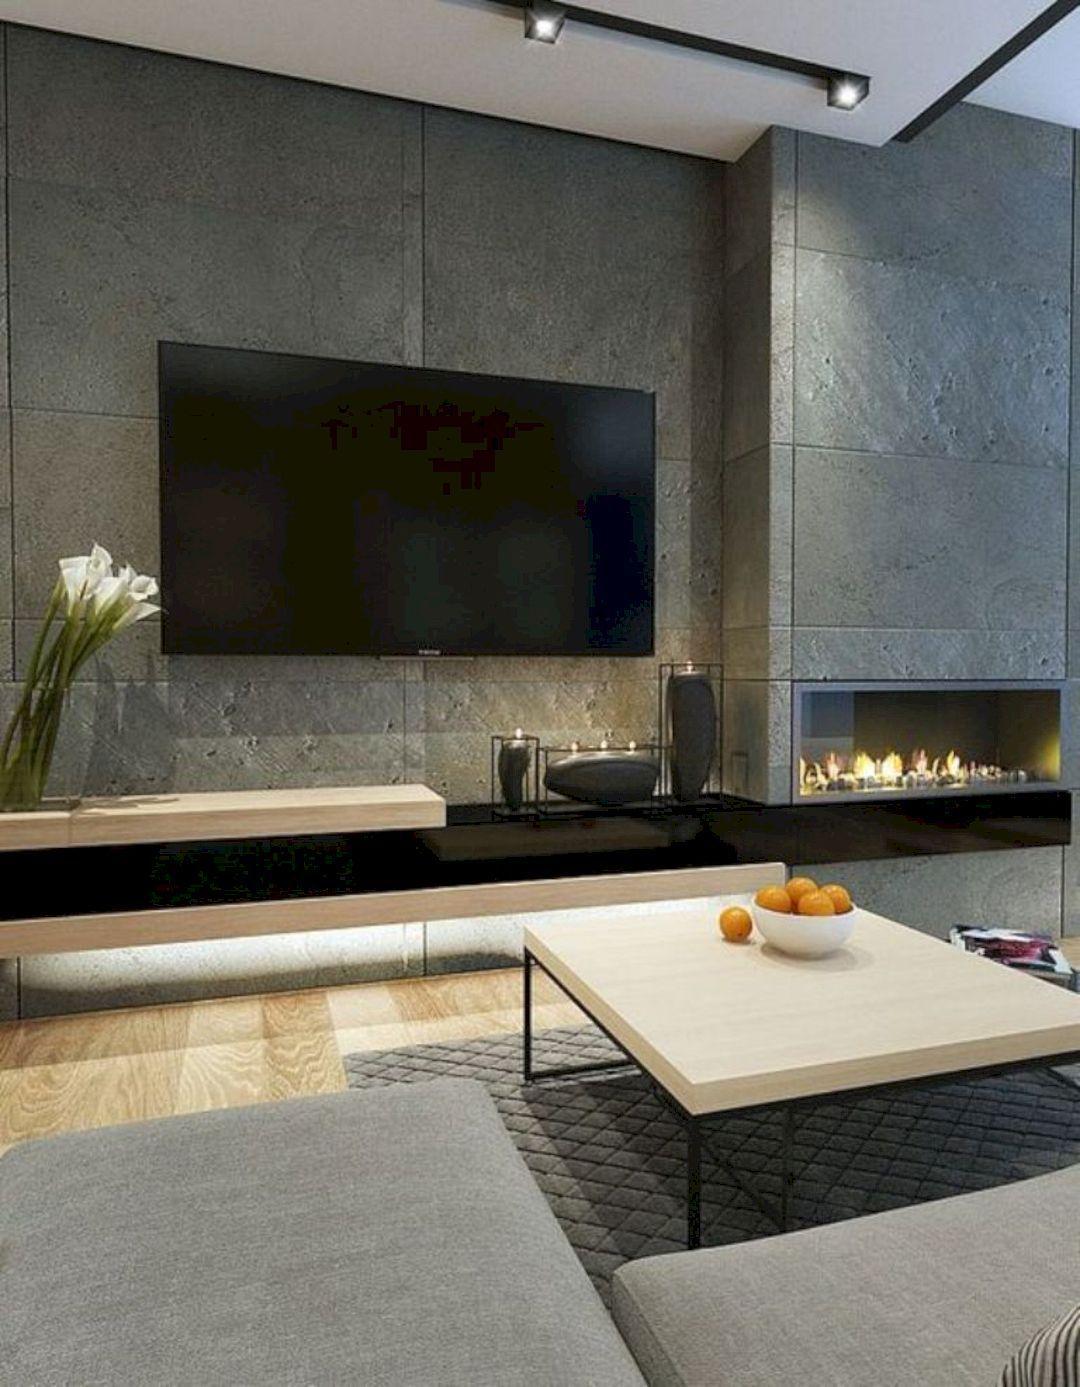 Modern Interior Design Ideas 16 | TV kast woonkamer | Pinterest ...